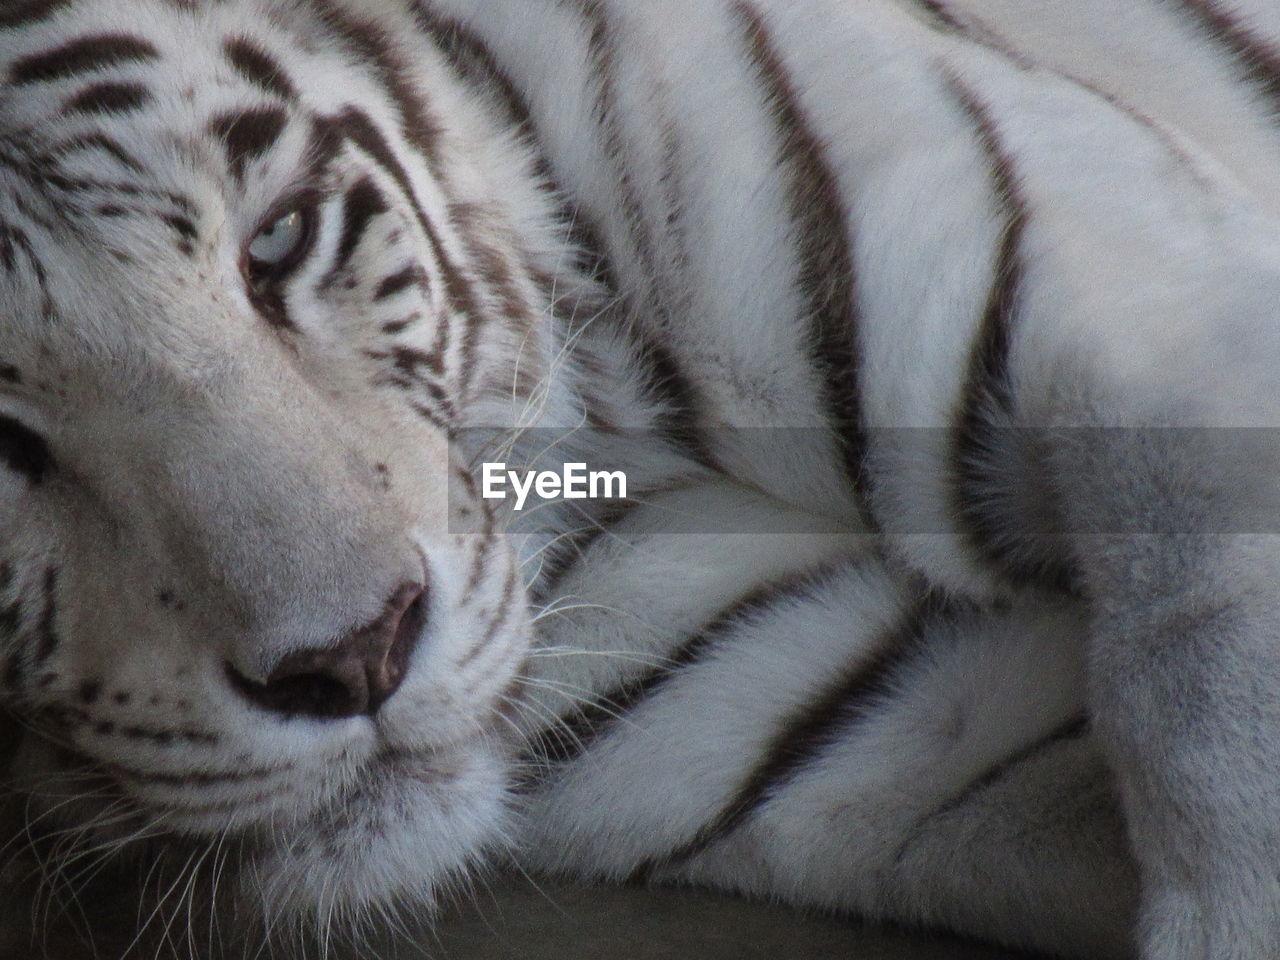 feline, cat, one animal, animal, mammal, animal themes, tiger, big cat, relaxation, animal wildlife, white tiger, close-up, no people, vertebrate, domestic animals, animal body part, resting, whisker, pets, animal head, undomesticated cat